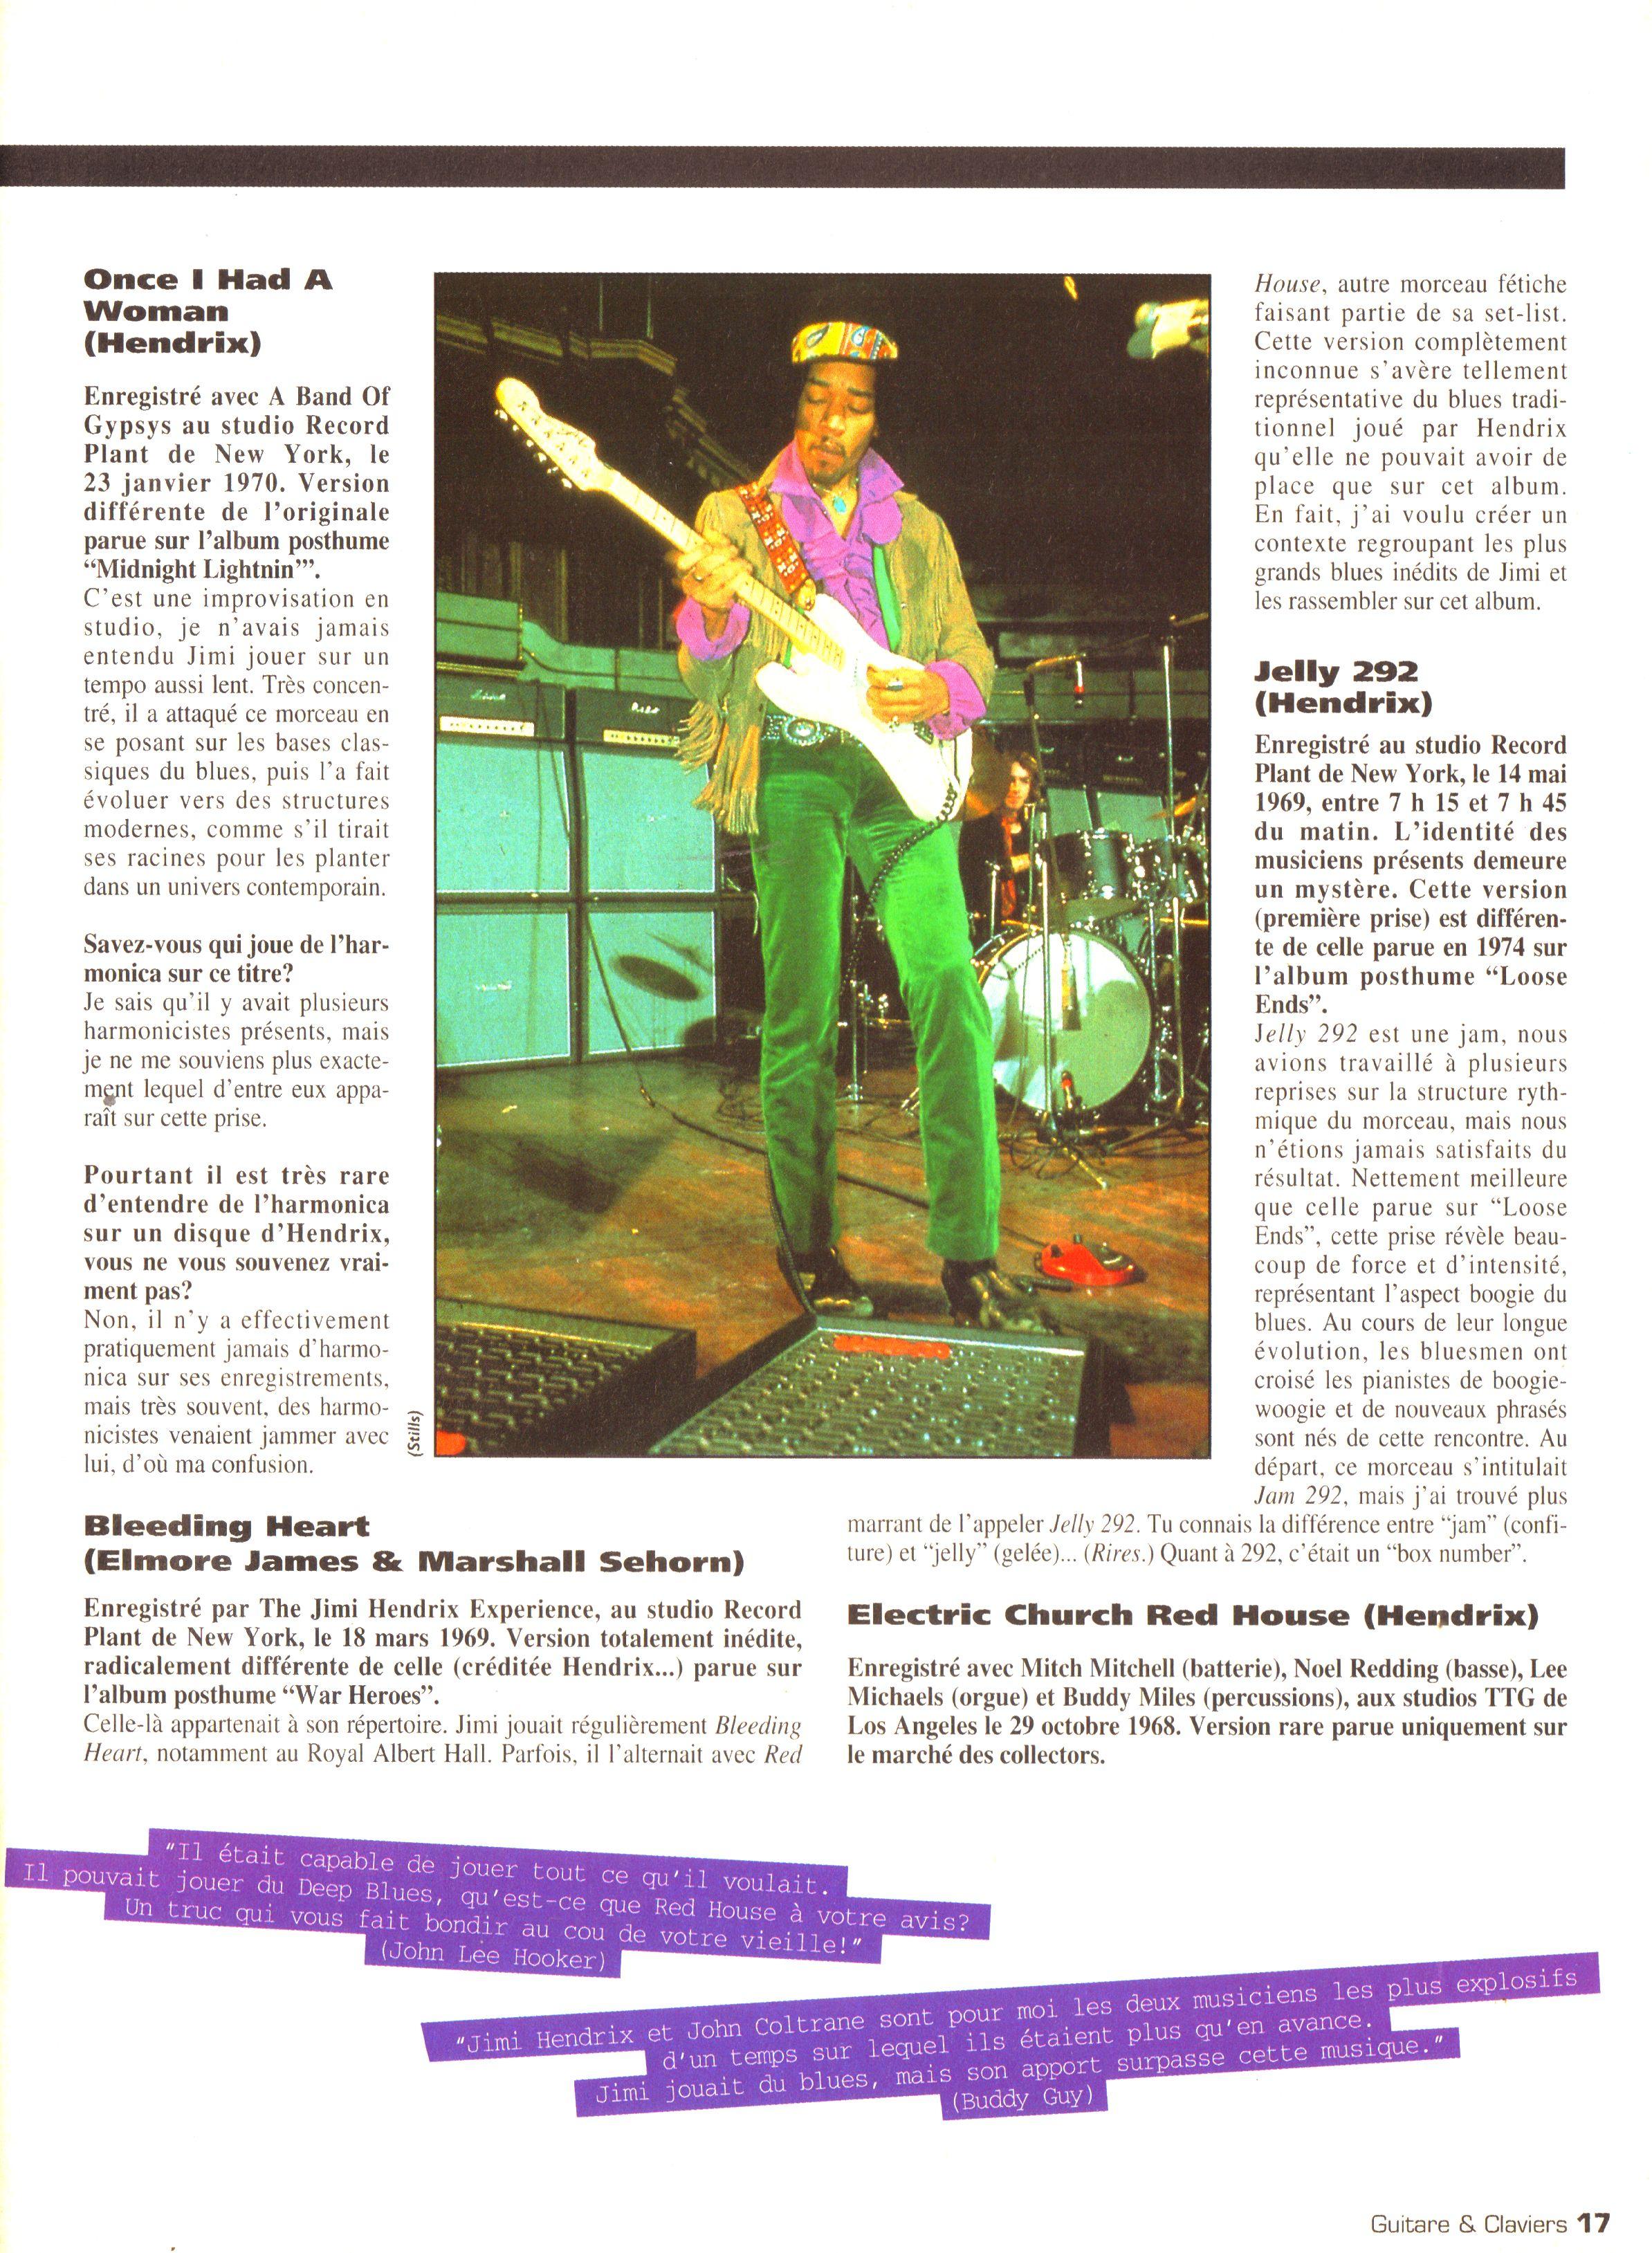 Magazines Français 1989 - 2014 GuitaretClavierAvril1994Page17